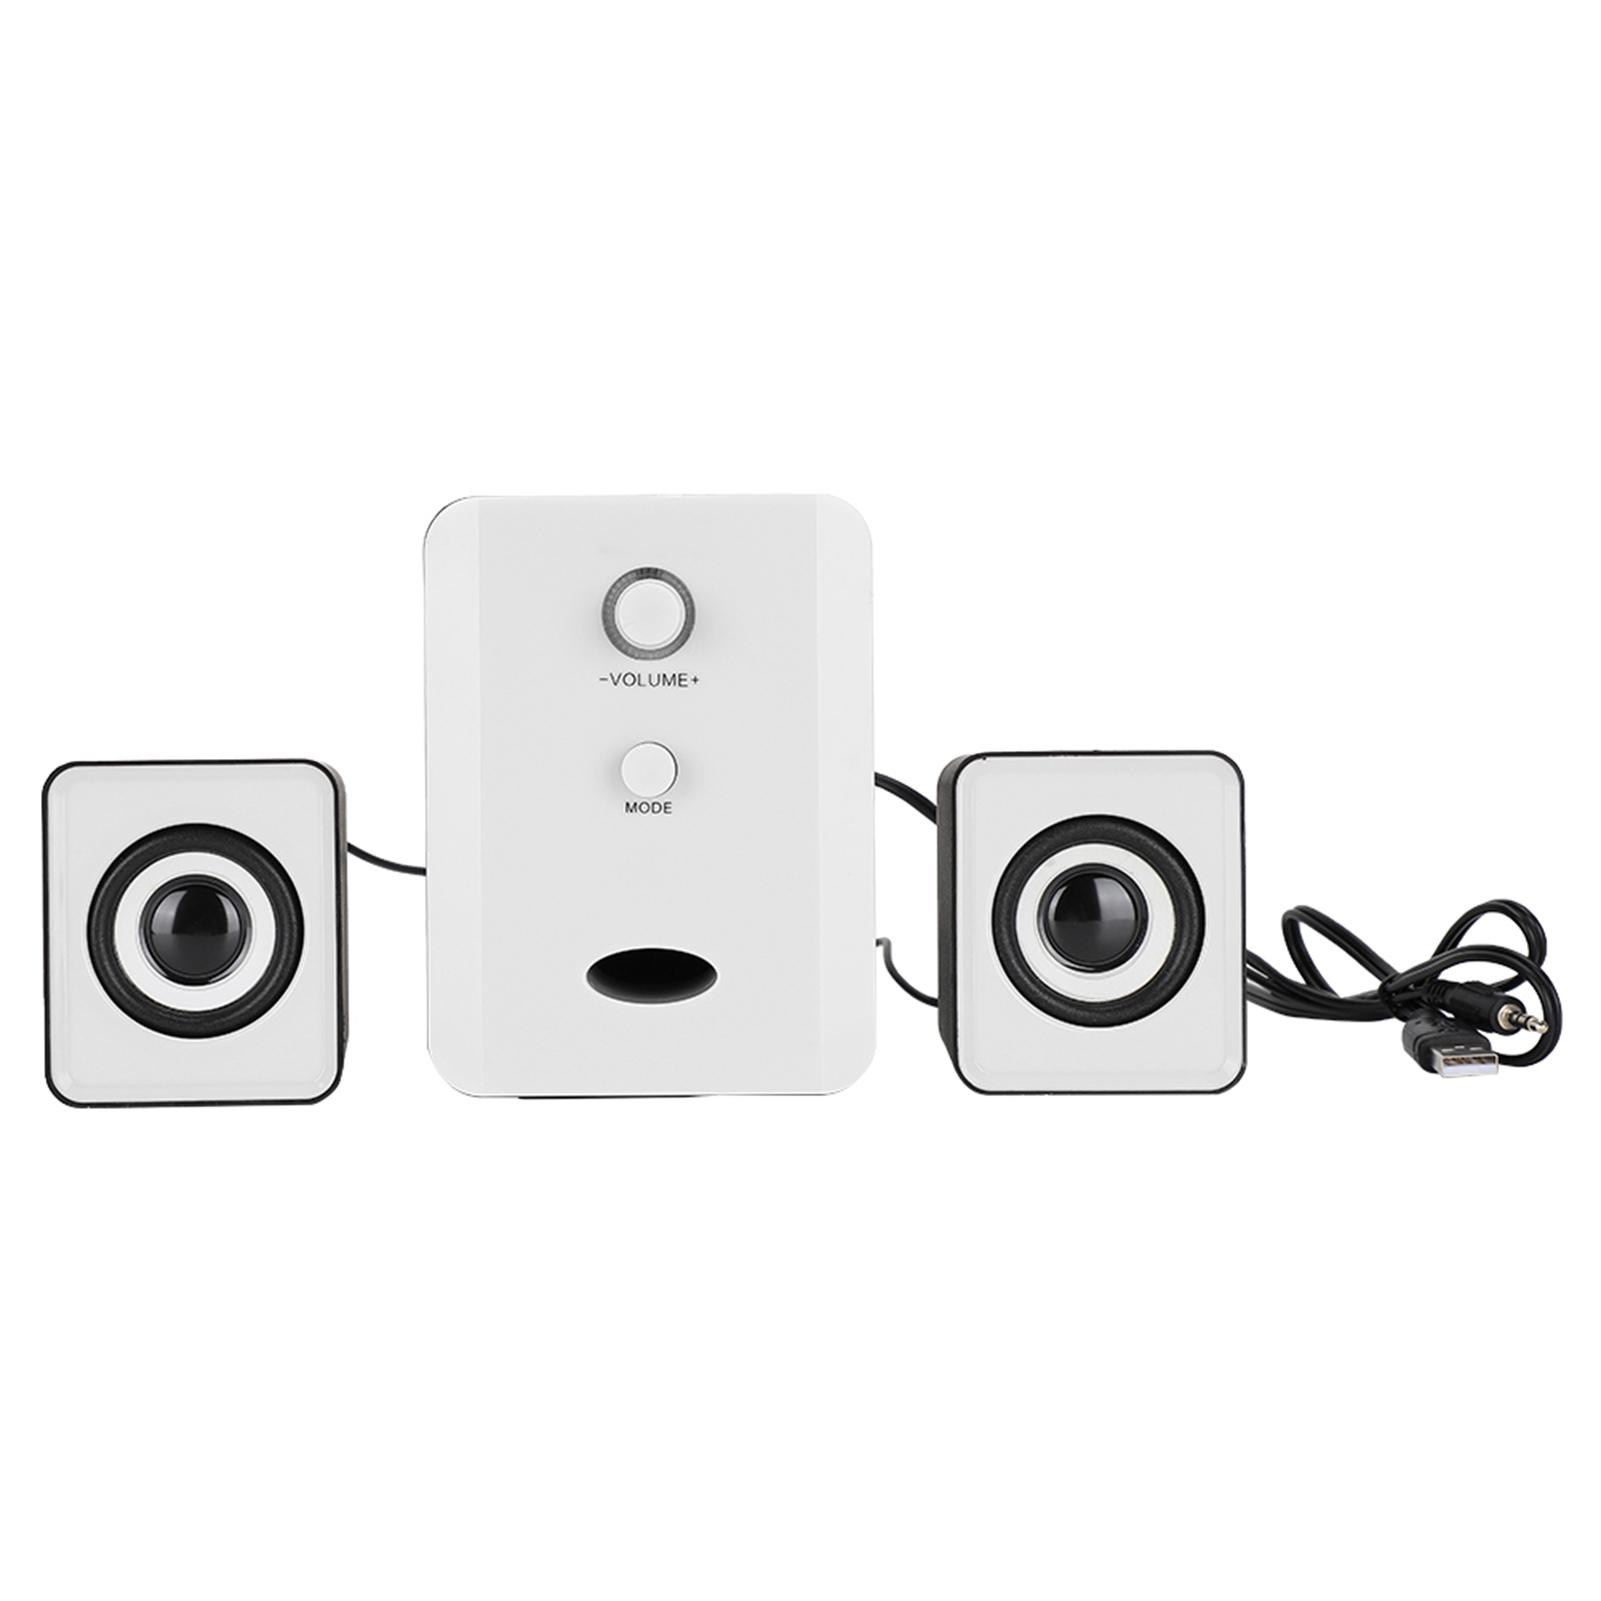 SADA-Bluetooth-Computer-Speaker-3-5mm-Desktop-Laptop-PC-Stereo-Bass-Subwoofer-SS thumbnail 88